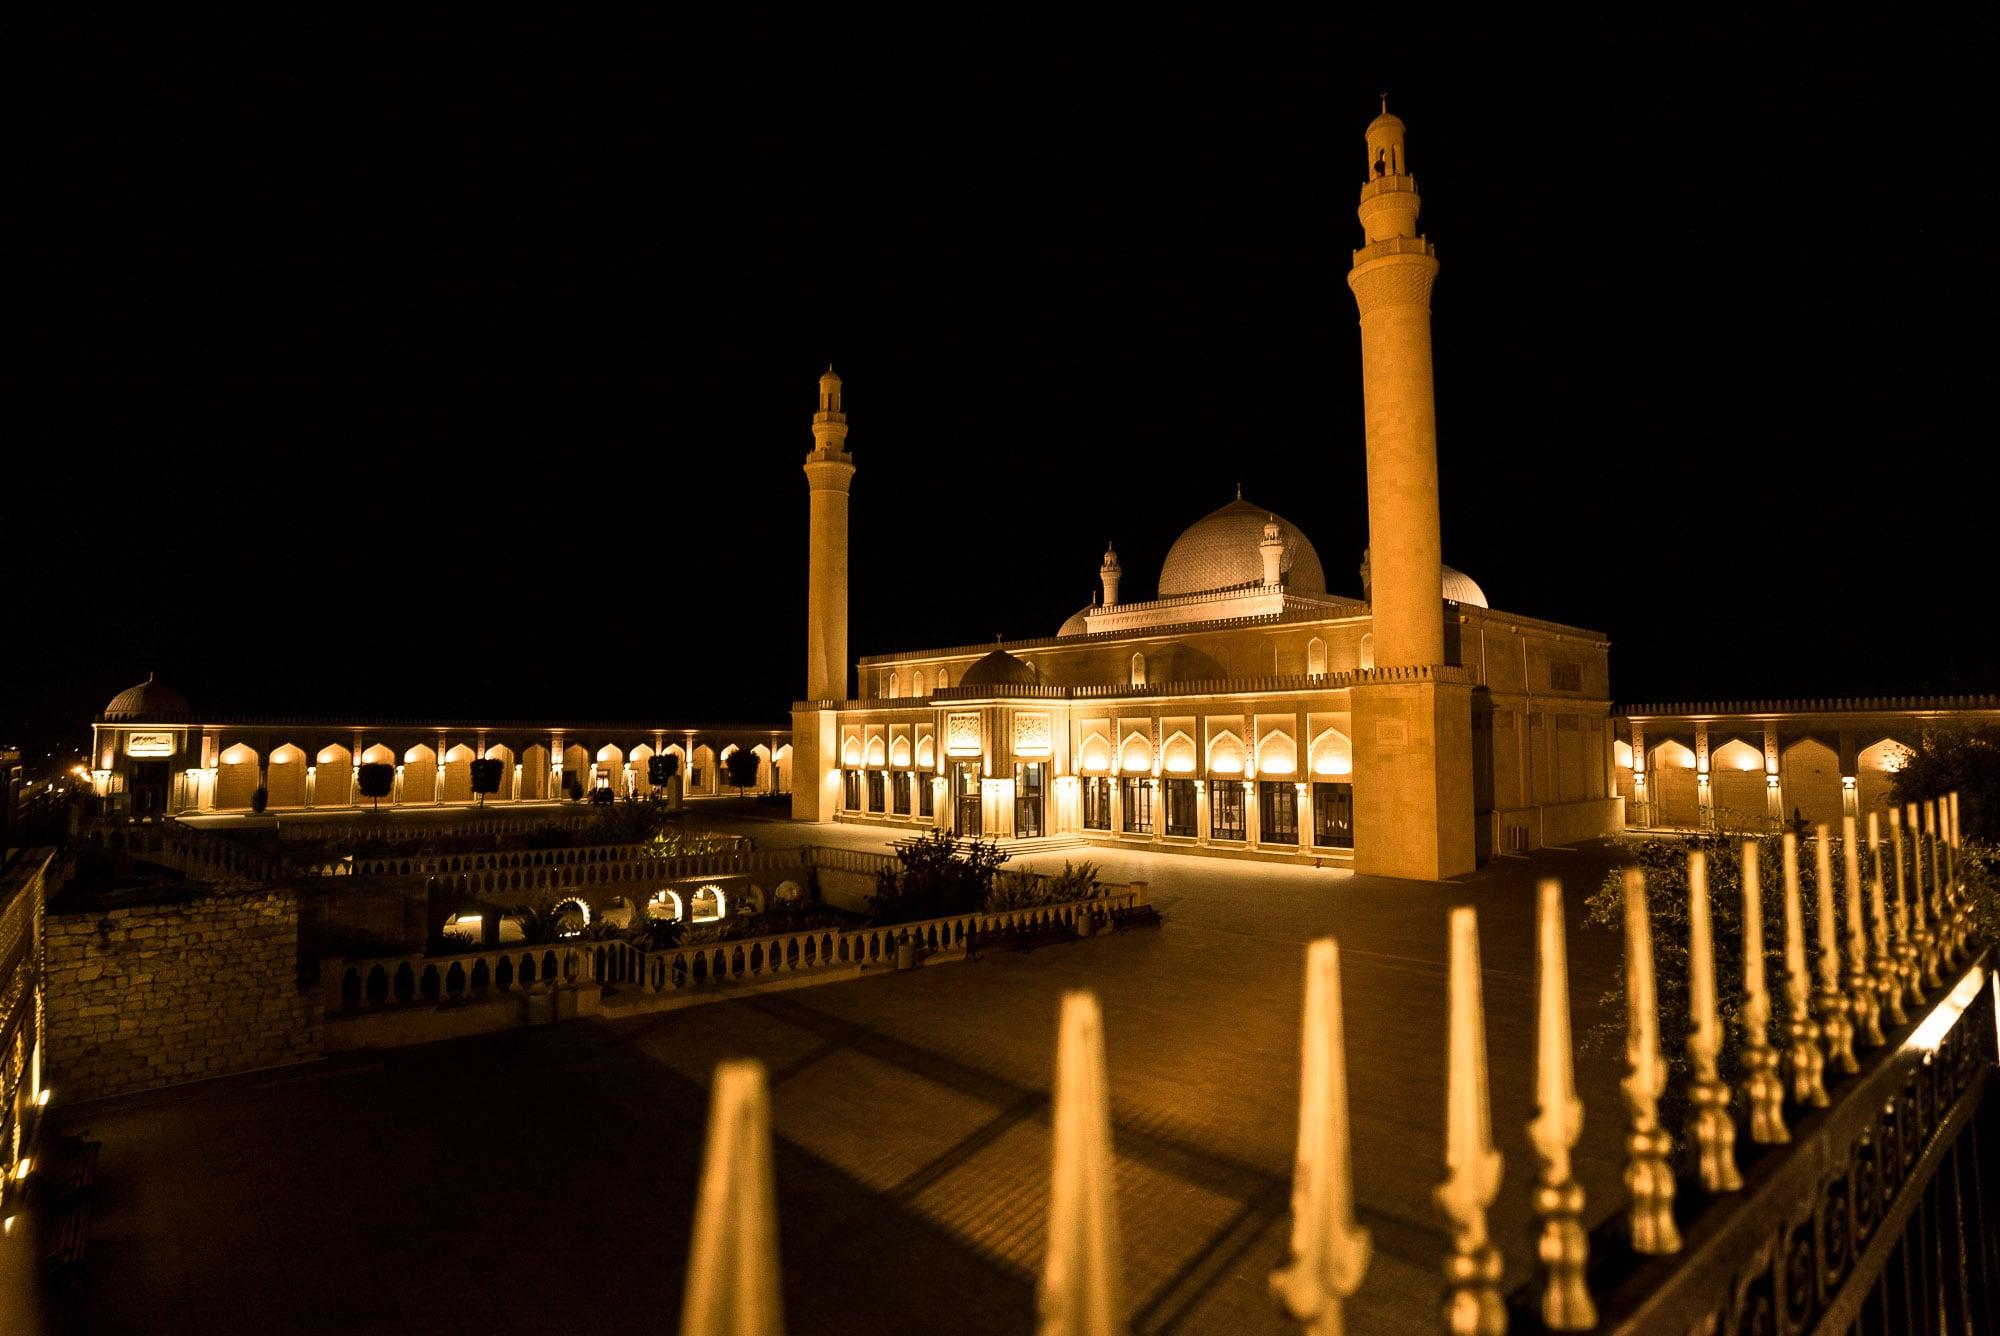 mosque in Shamakhi